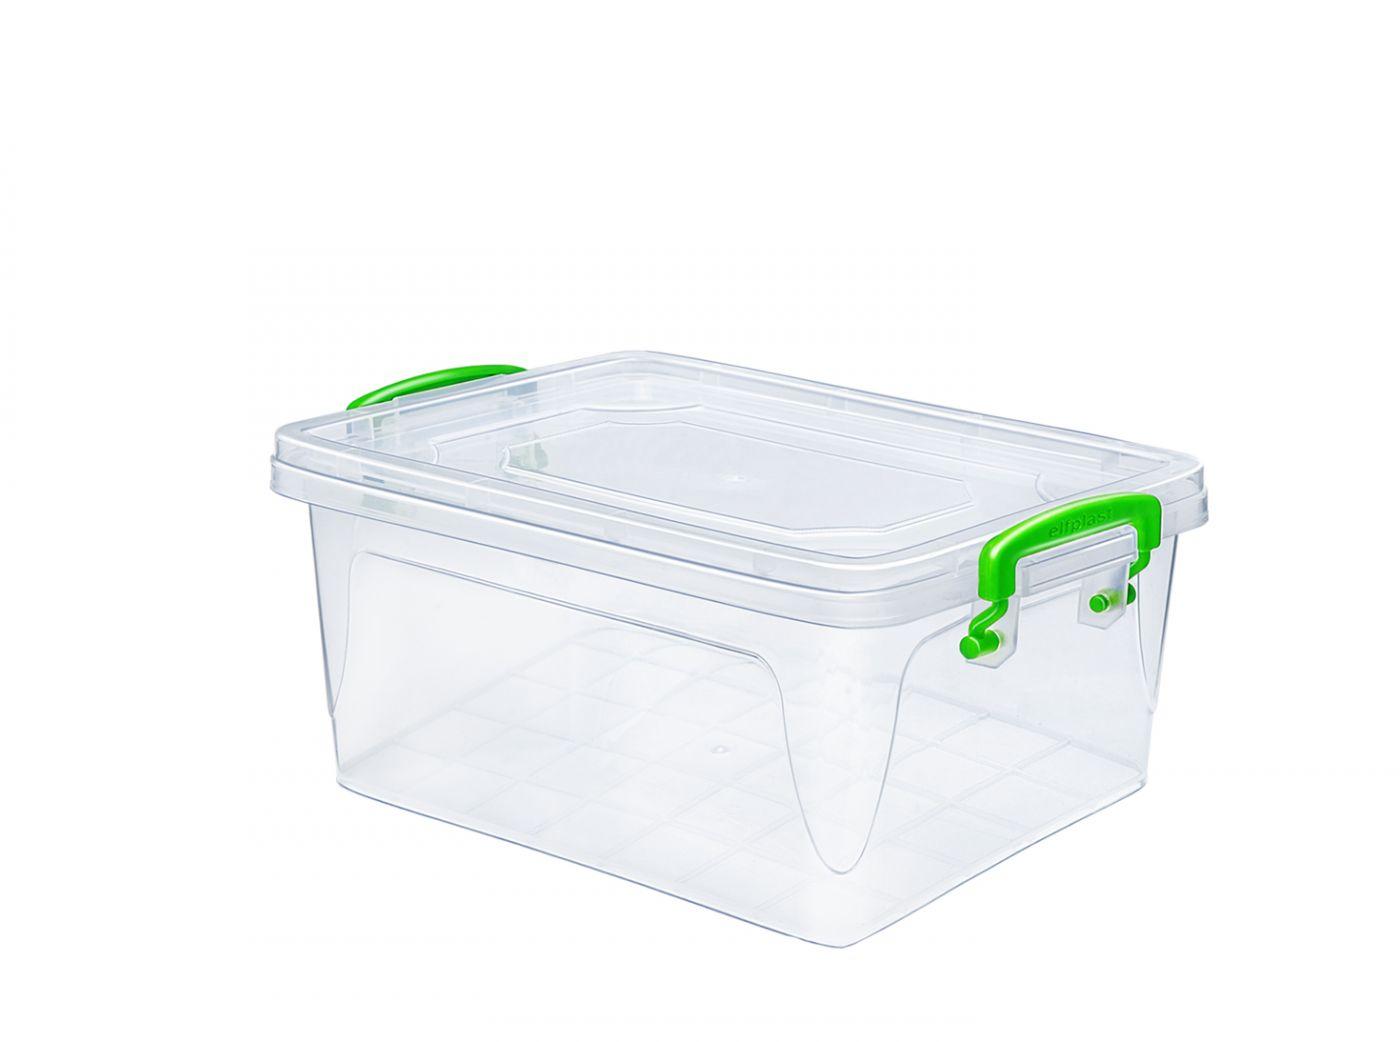 Контейнер для хранения Эльфпласт Fresh Box 3 литра с крышкой 25,5х17,3х11,5 см